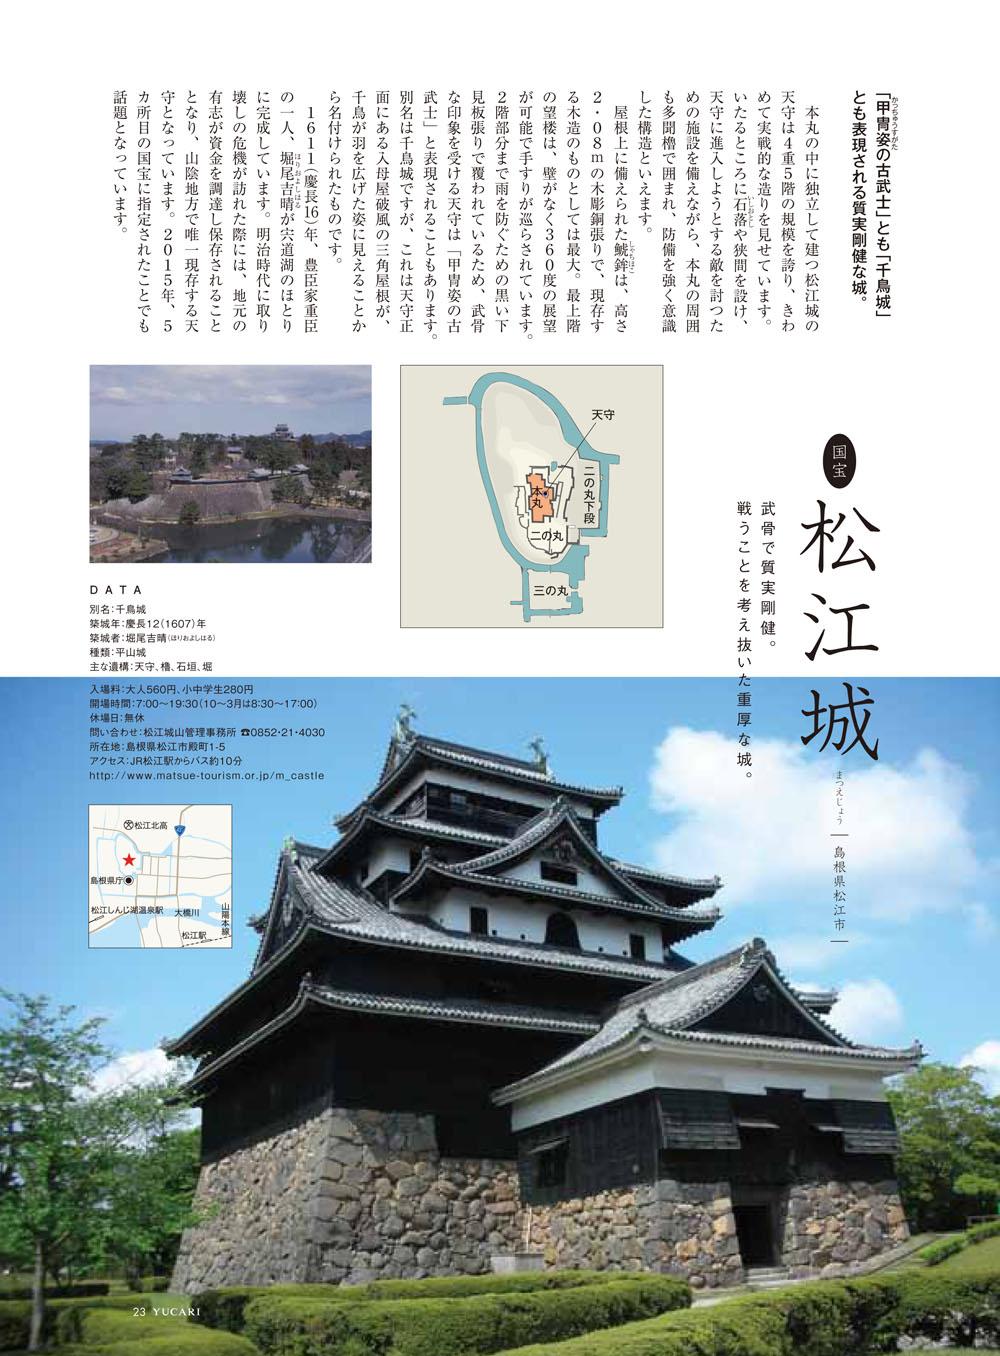 YUCARI_26_23.jpg